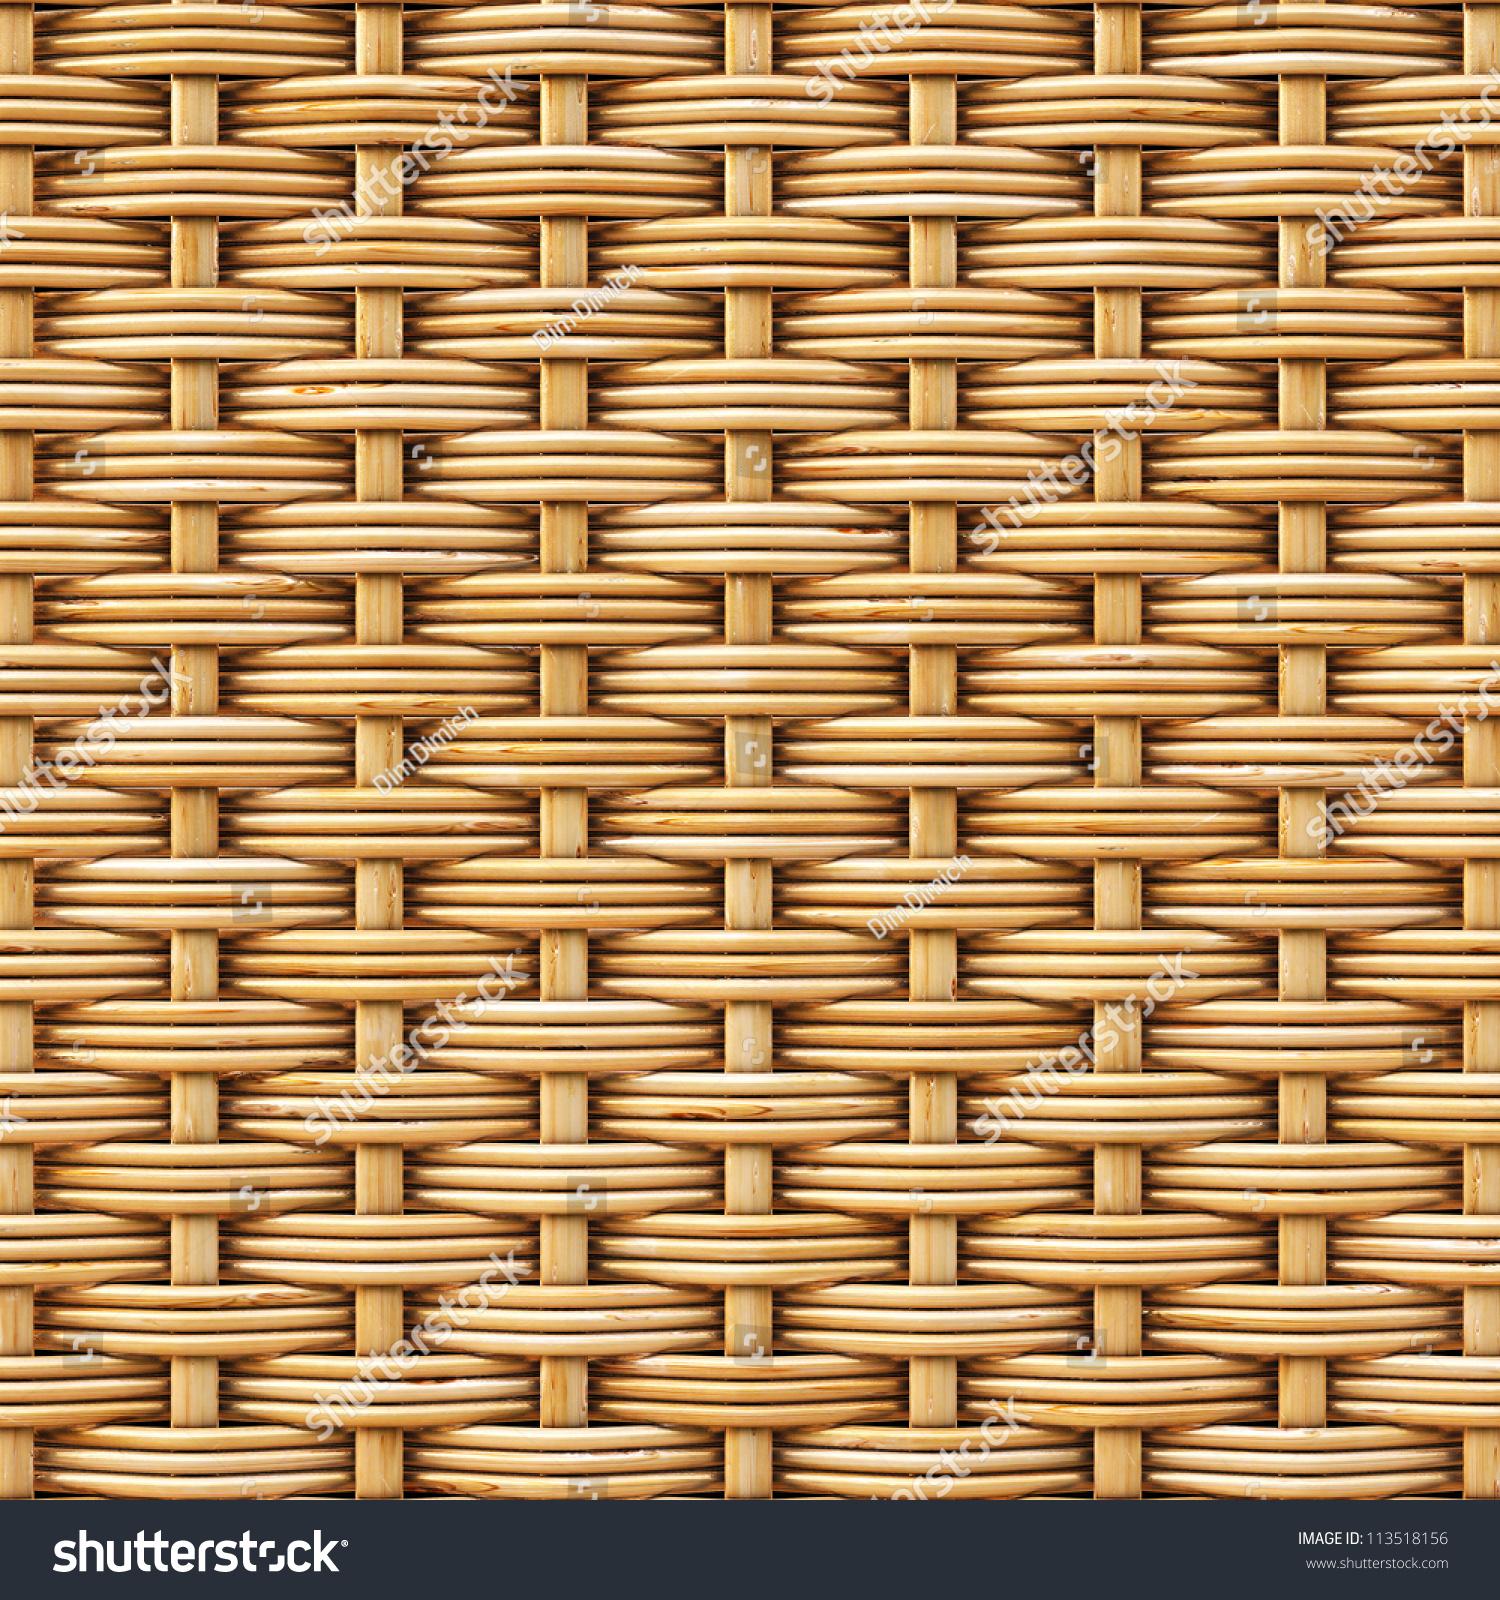 woven rattan natural patterns stock illustration 113518156 shutterstock. Black Bedroom Furniture Sets. Home Design Ideas